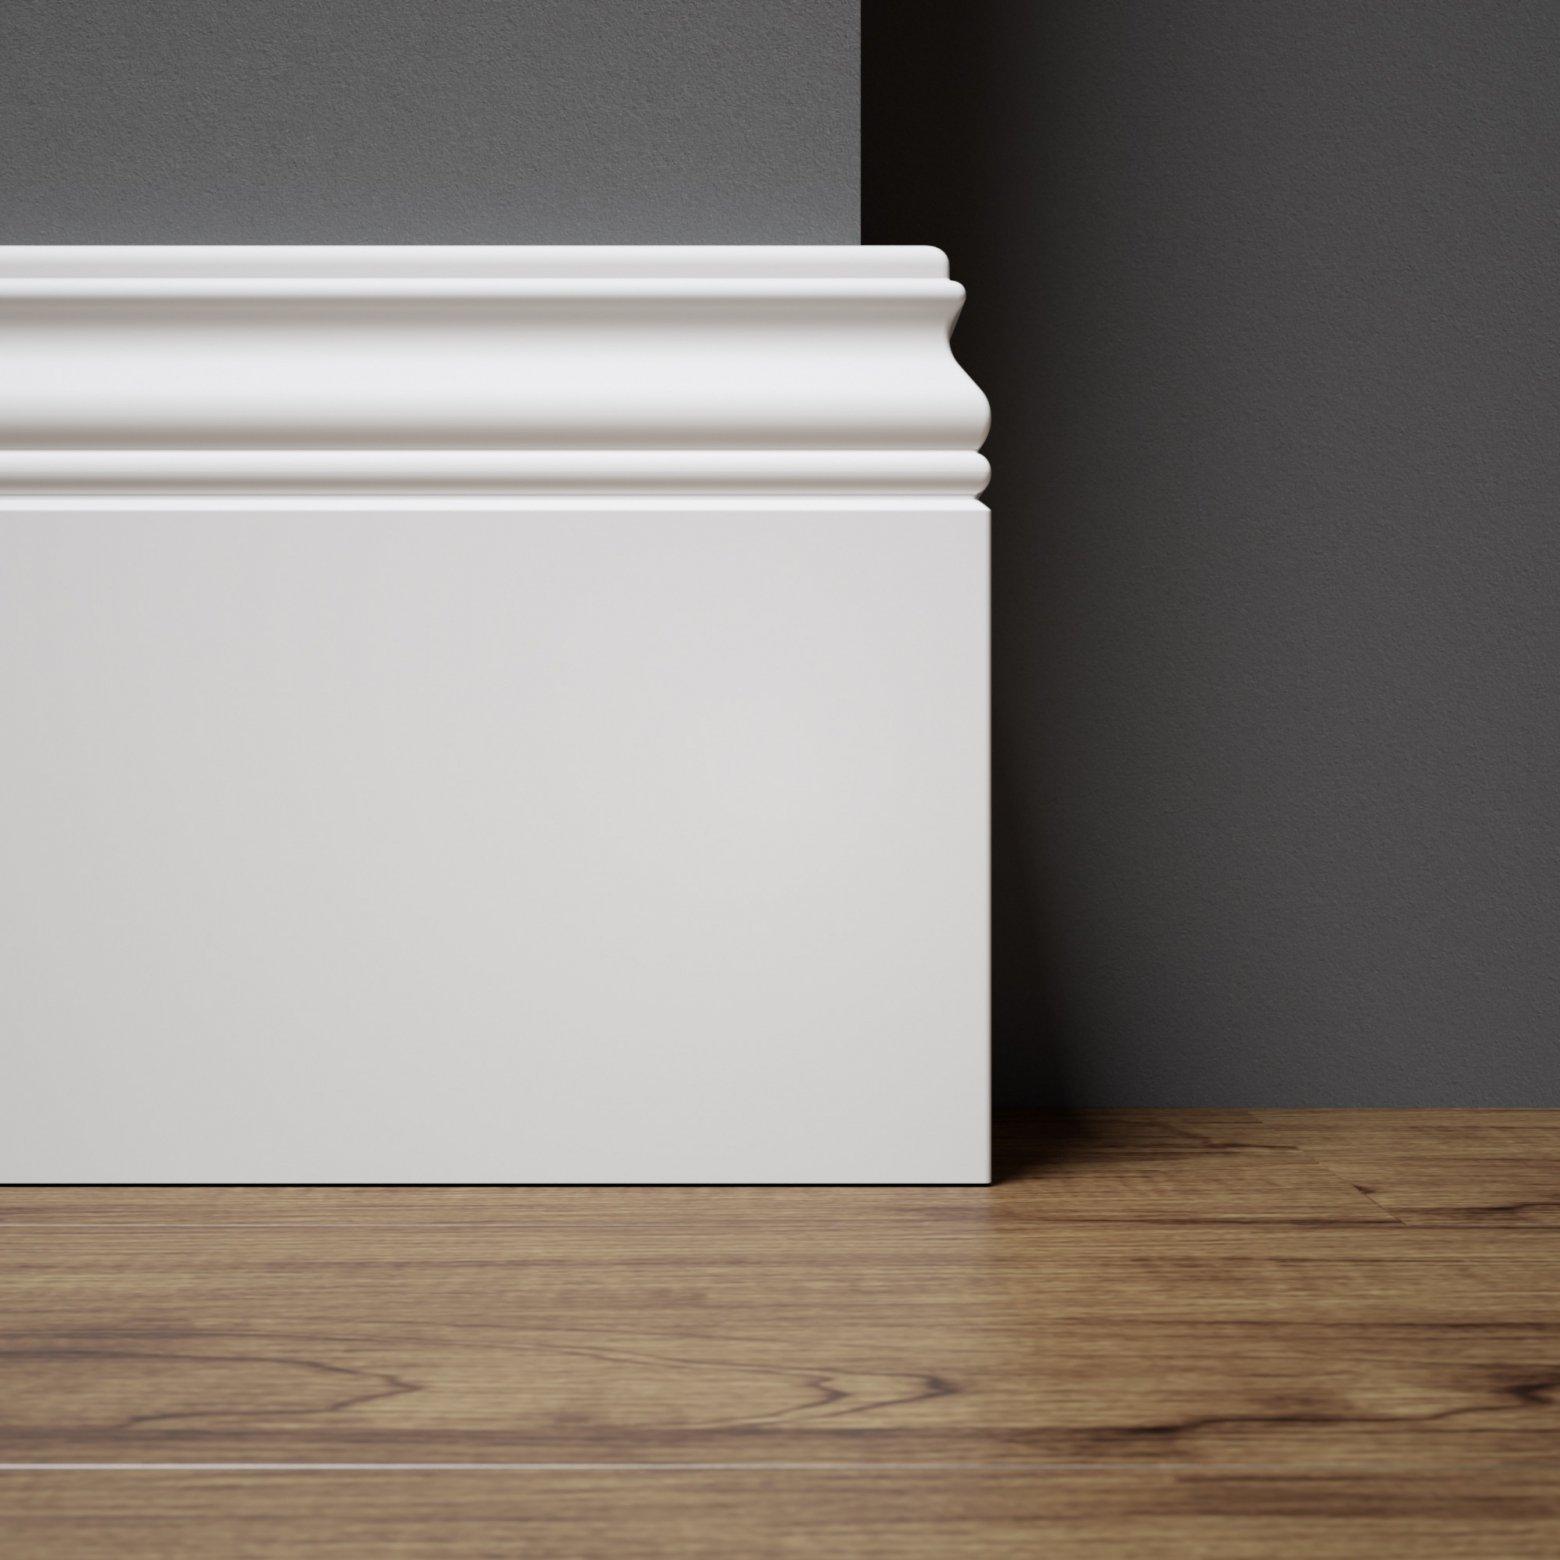 Biala listwa podlogowa lakierowana - Alexa